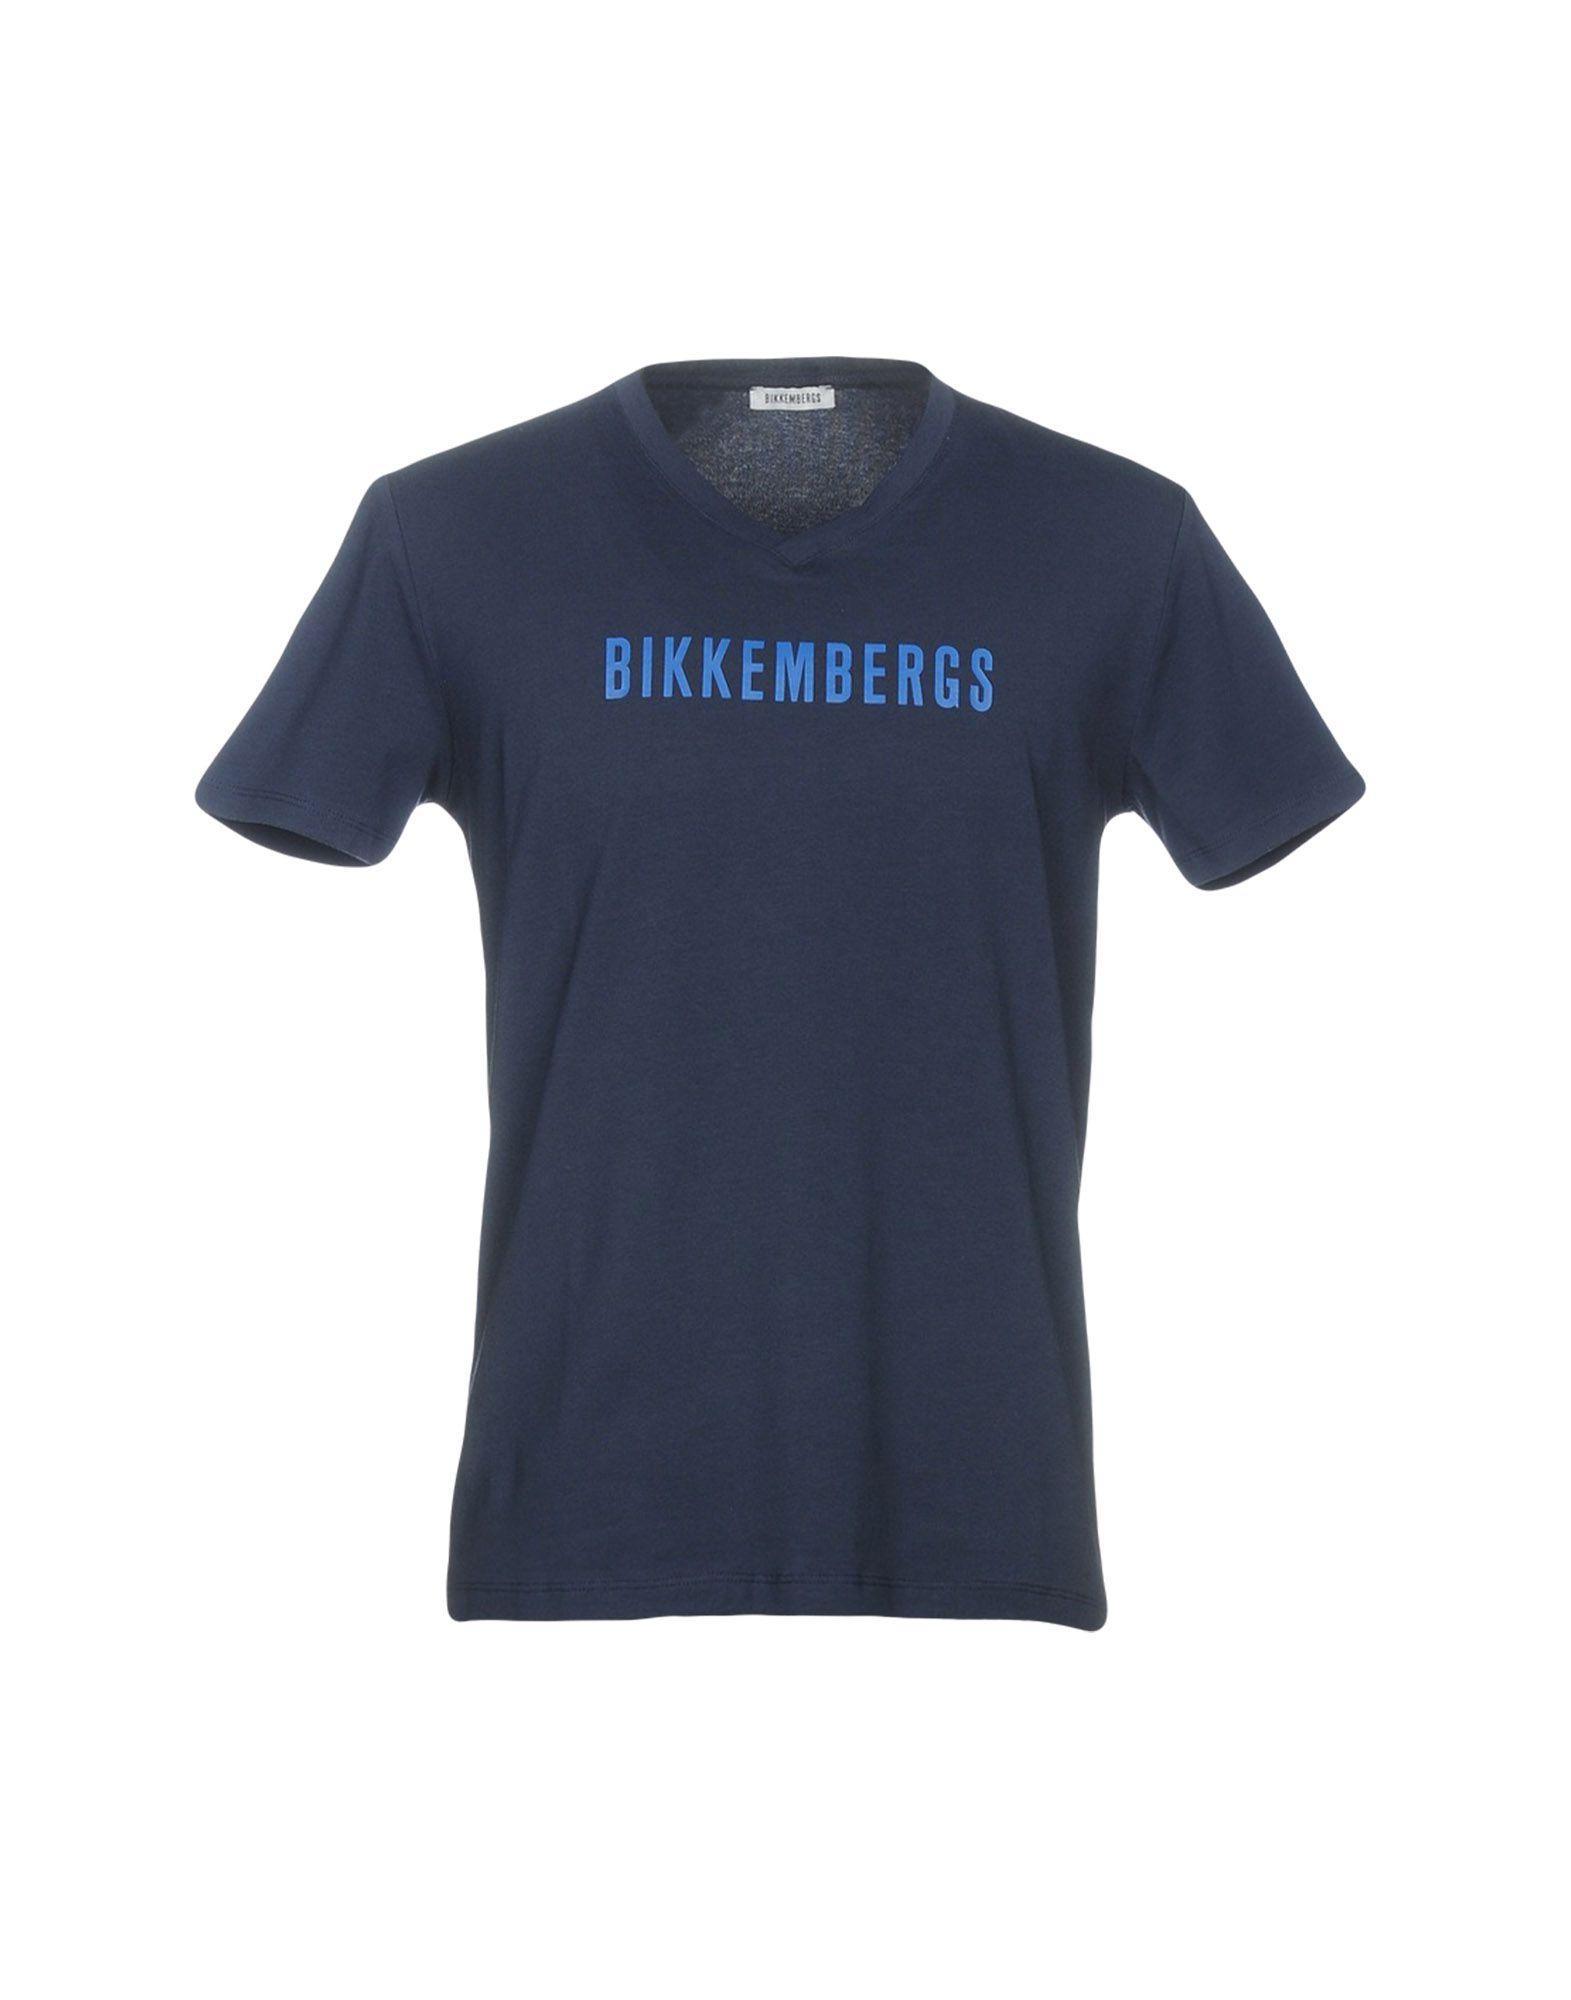 Bikkembergs T-shirt In Dark Blue